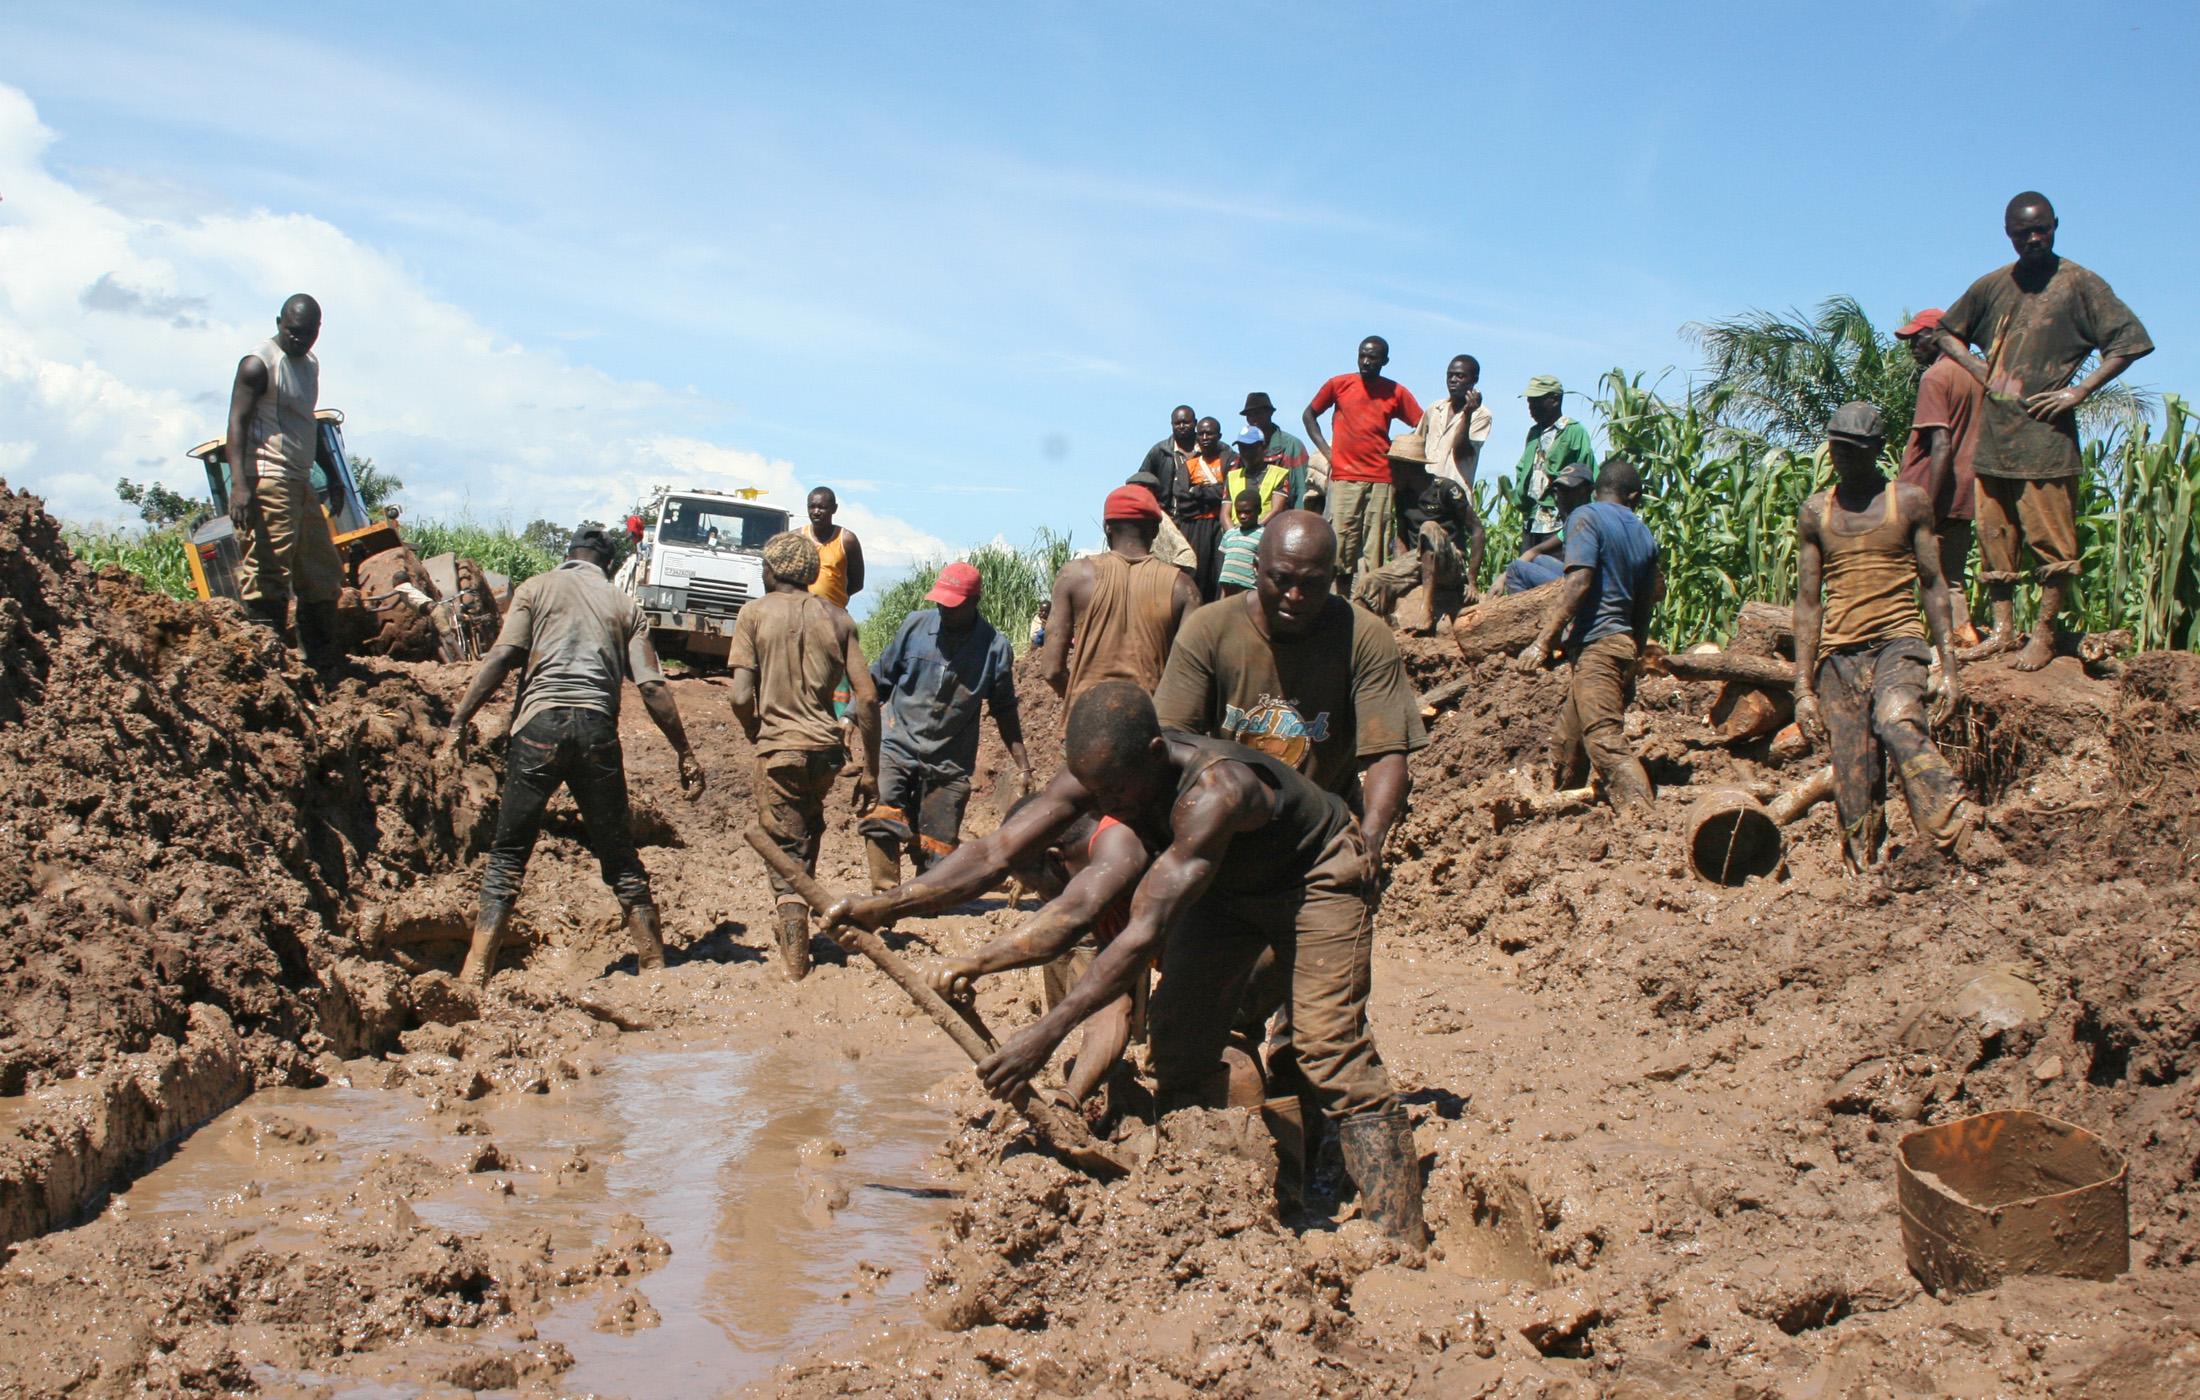 Poverty amid mining riches in Katanga